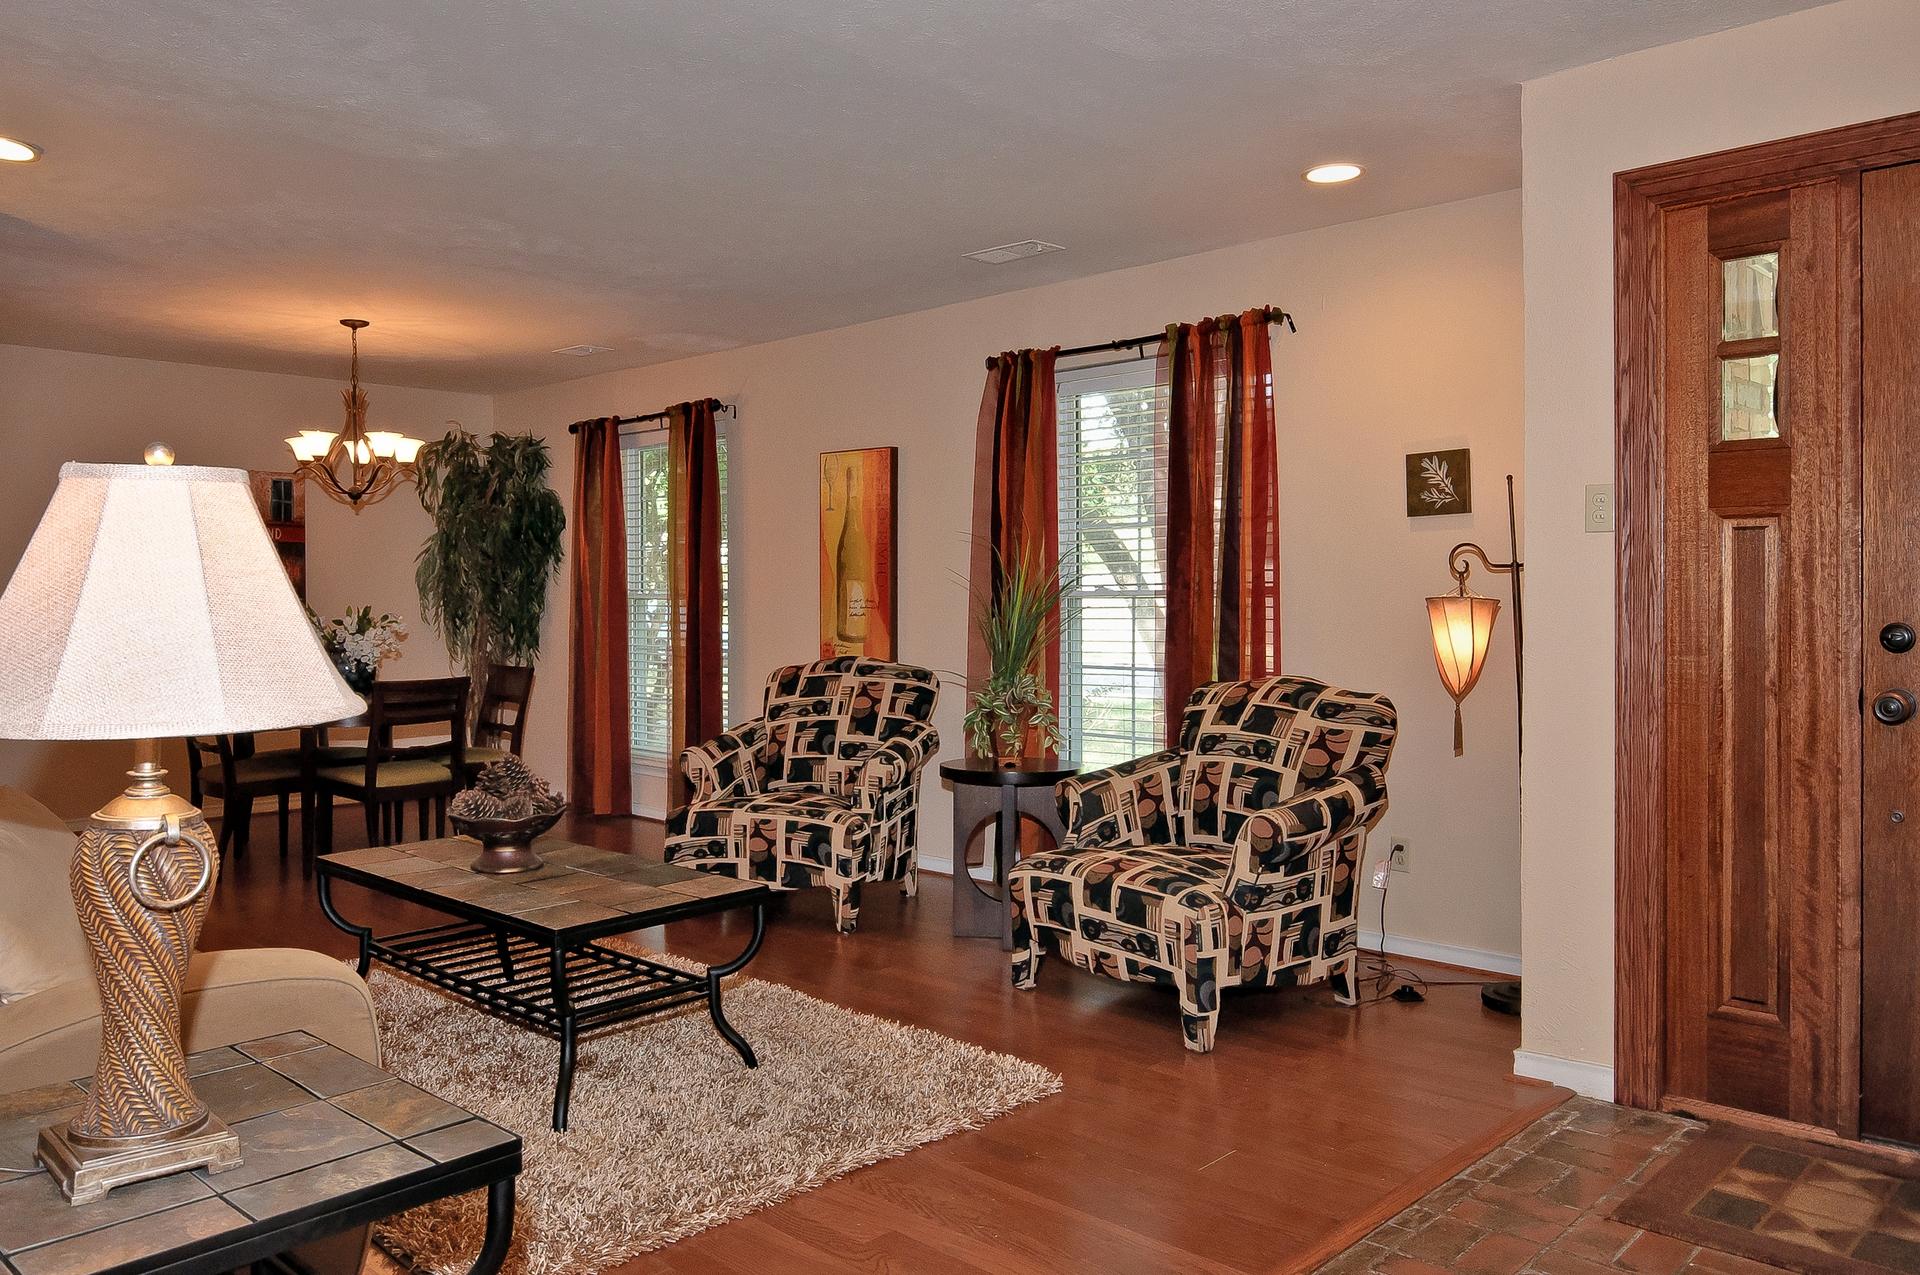 10414 Carry Back Cir Living Room & Entry.jpg